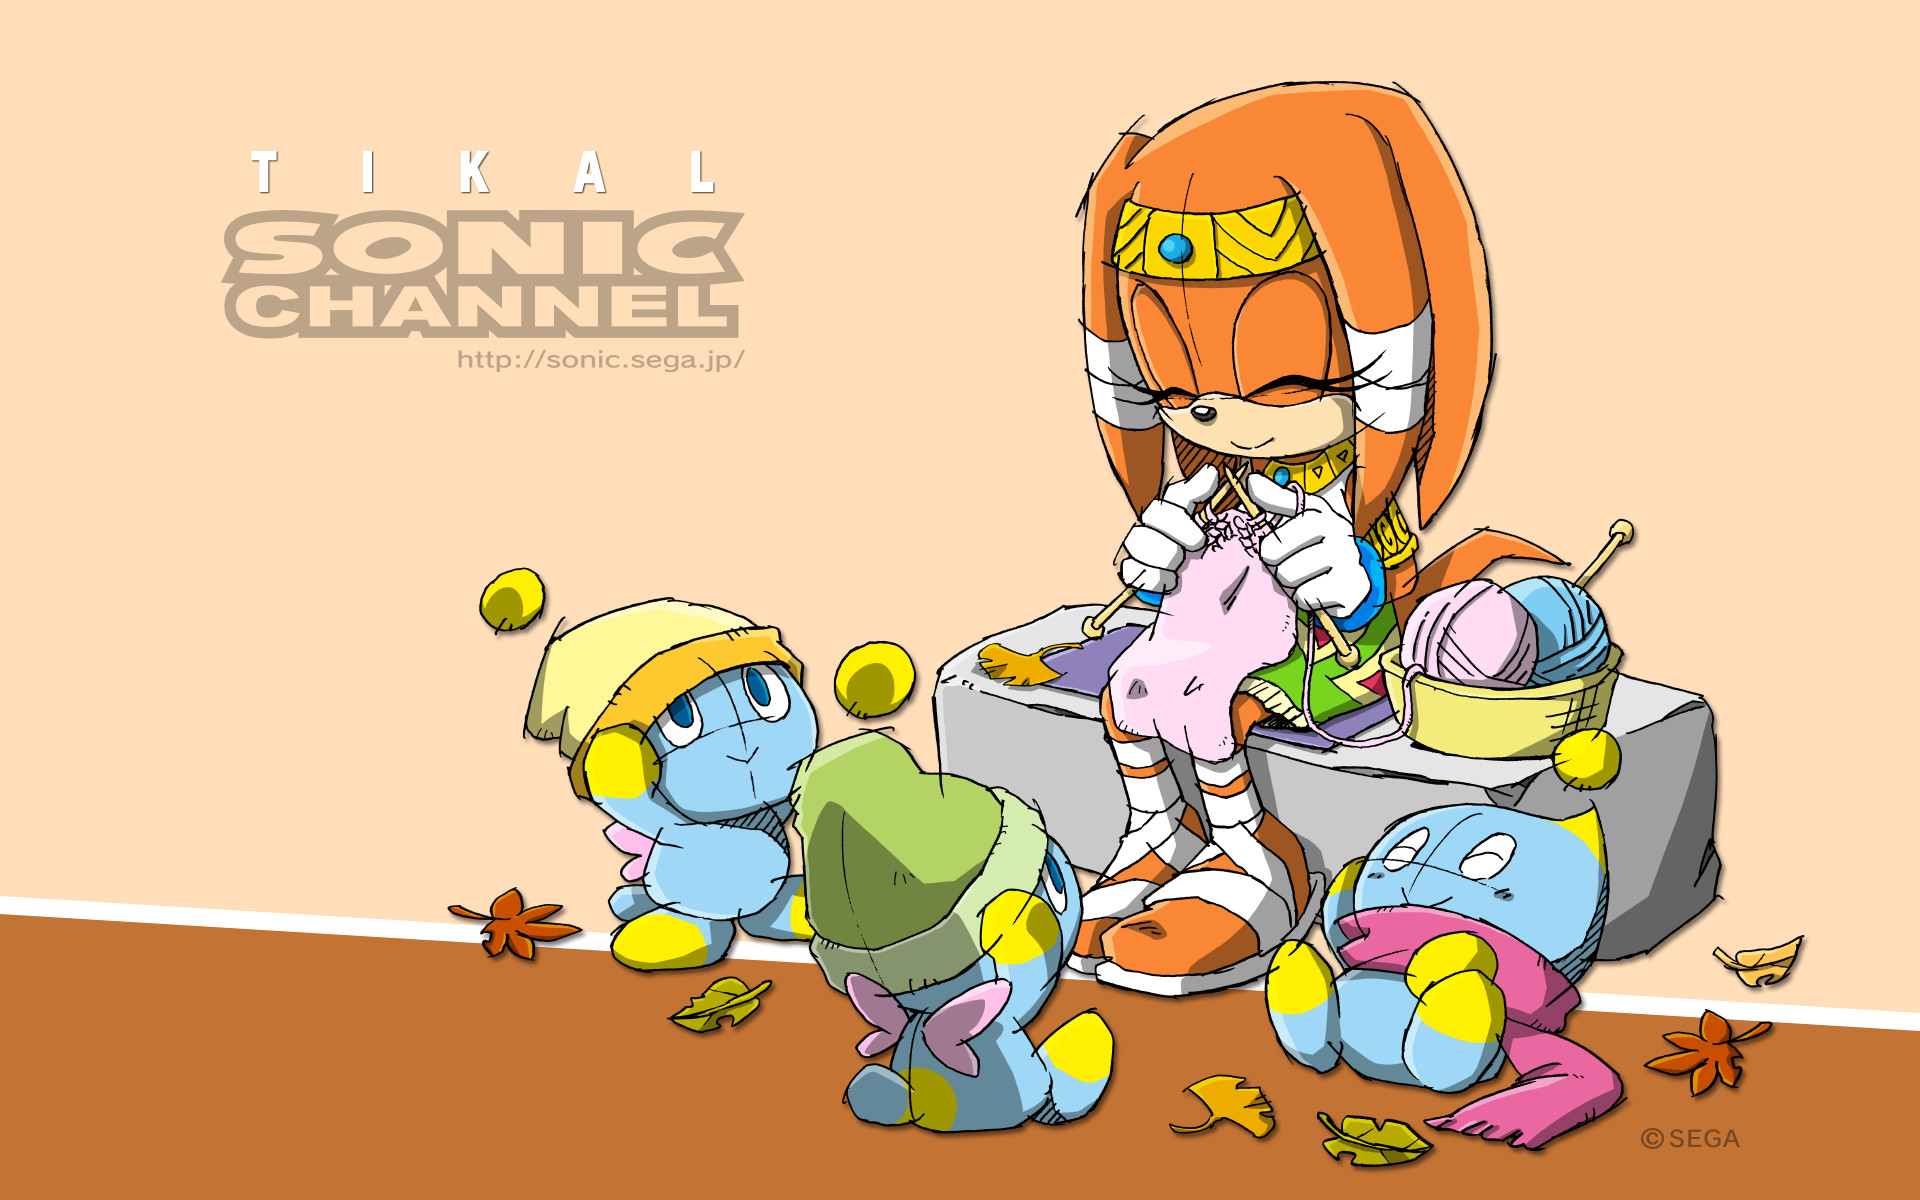 wallpaper_132_tikal_02_pc.png (1920×1200)   Sonic the hedgehog   Pinterest    Anime